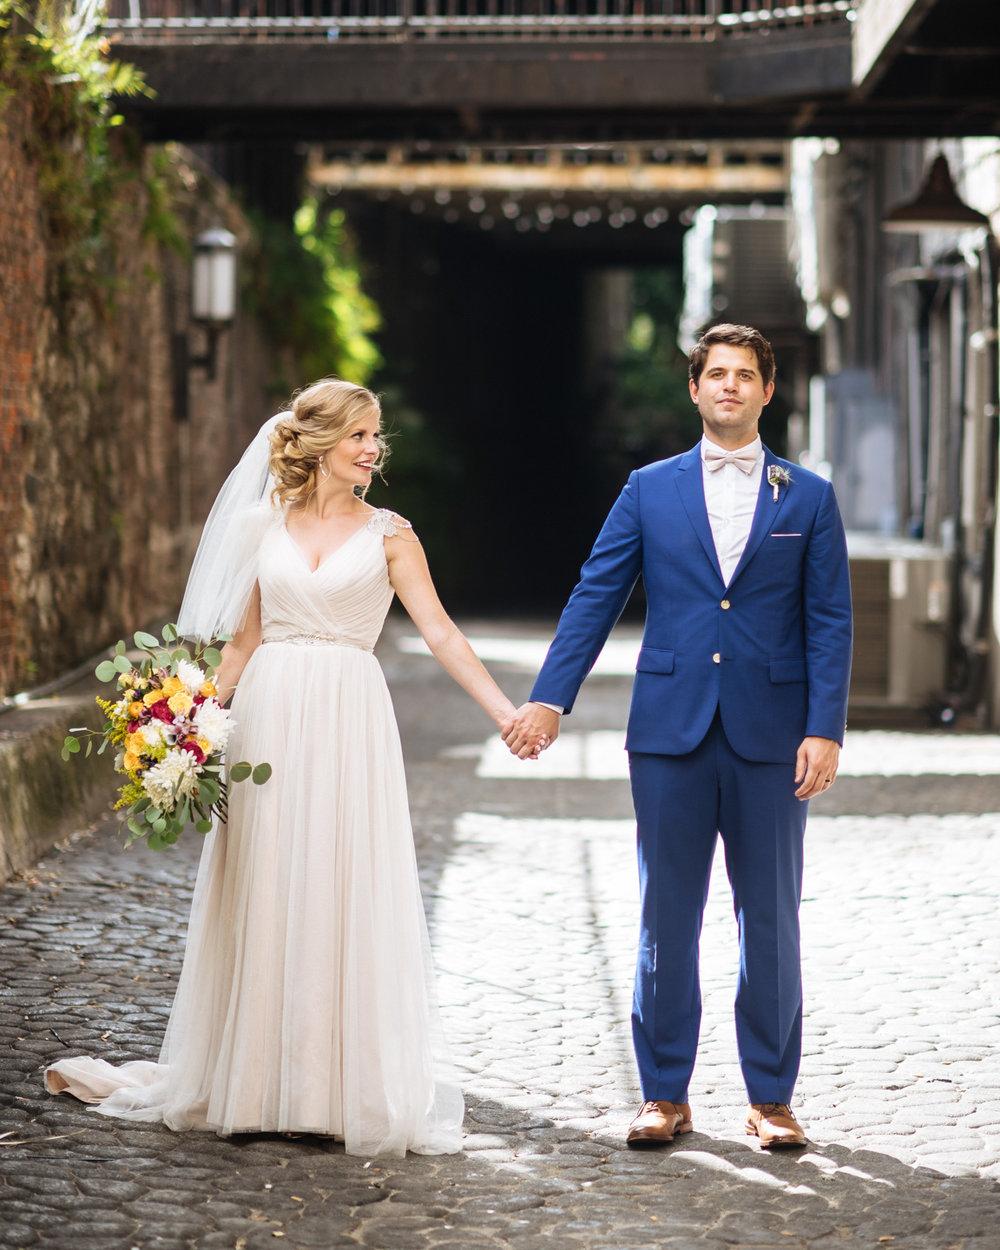 melissa-andrew-soho-south-wedding-lafayette-square-wedding-historic-savannah-wedding-ivory-and-beau-bridal-boutique-savannah-florist-savannah-wedding-planner-southern-wedding-destination-wedding-35.jpg